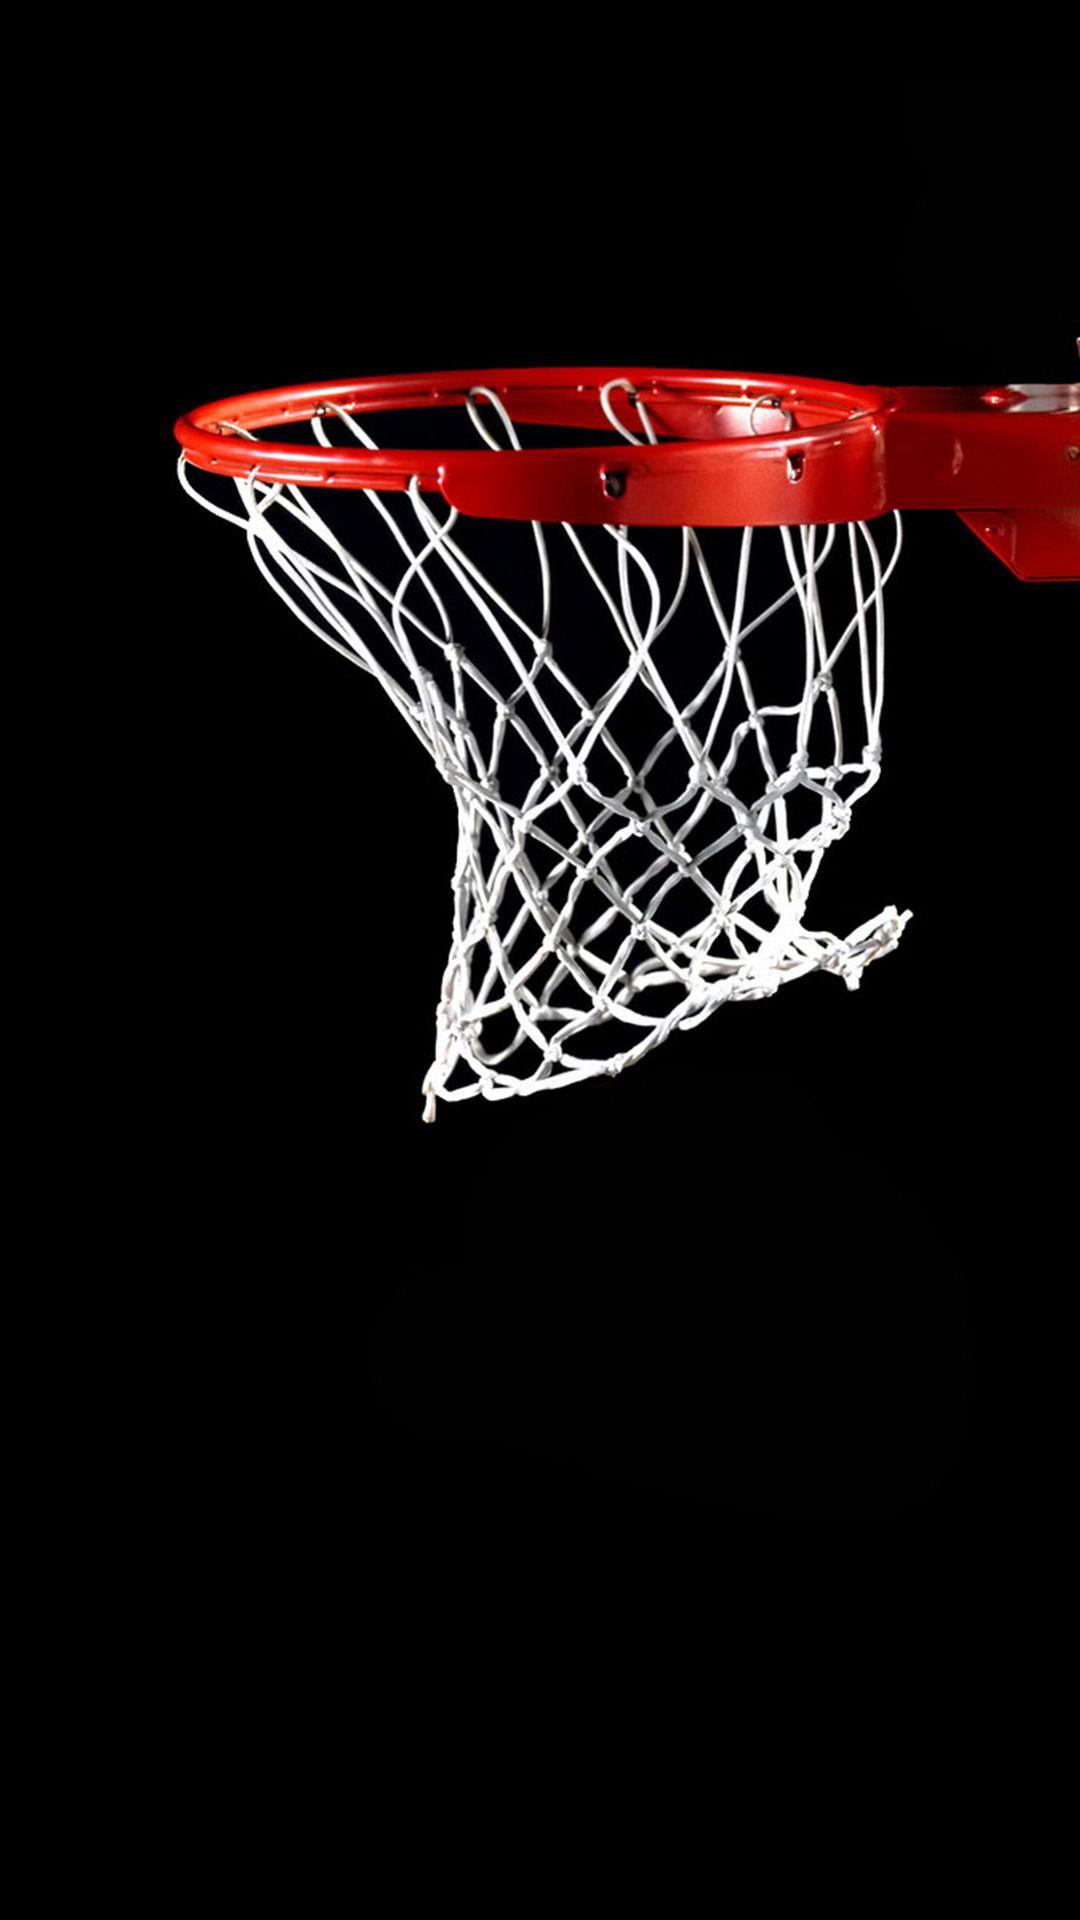 Joe Johnson Dream team Wallpaper | Basketball Wallpapers at ...